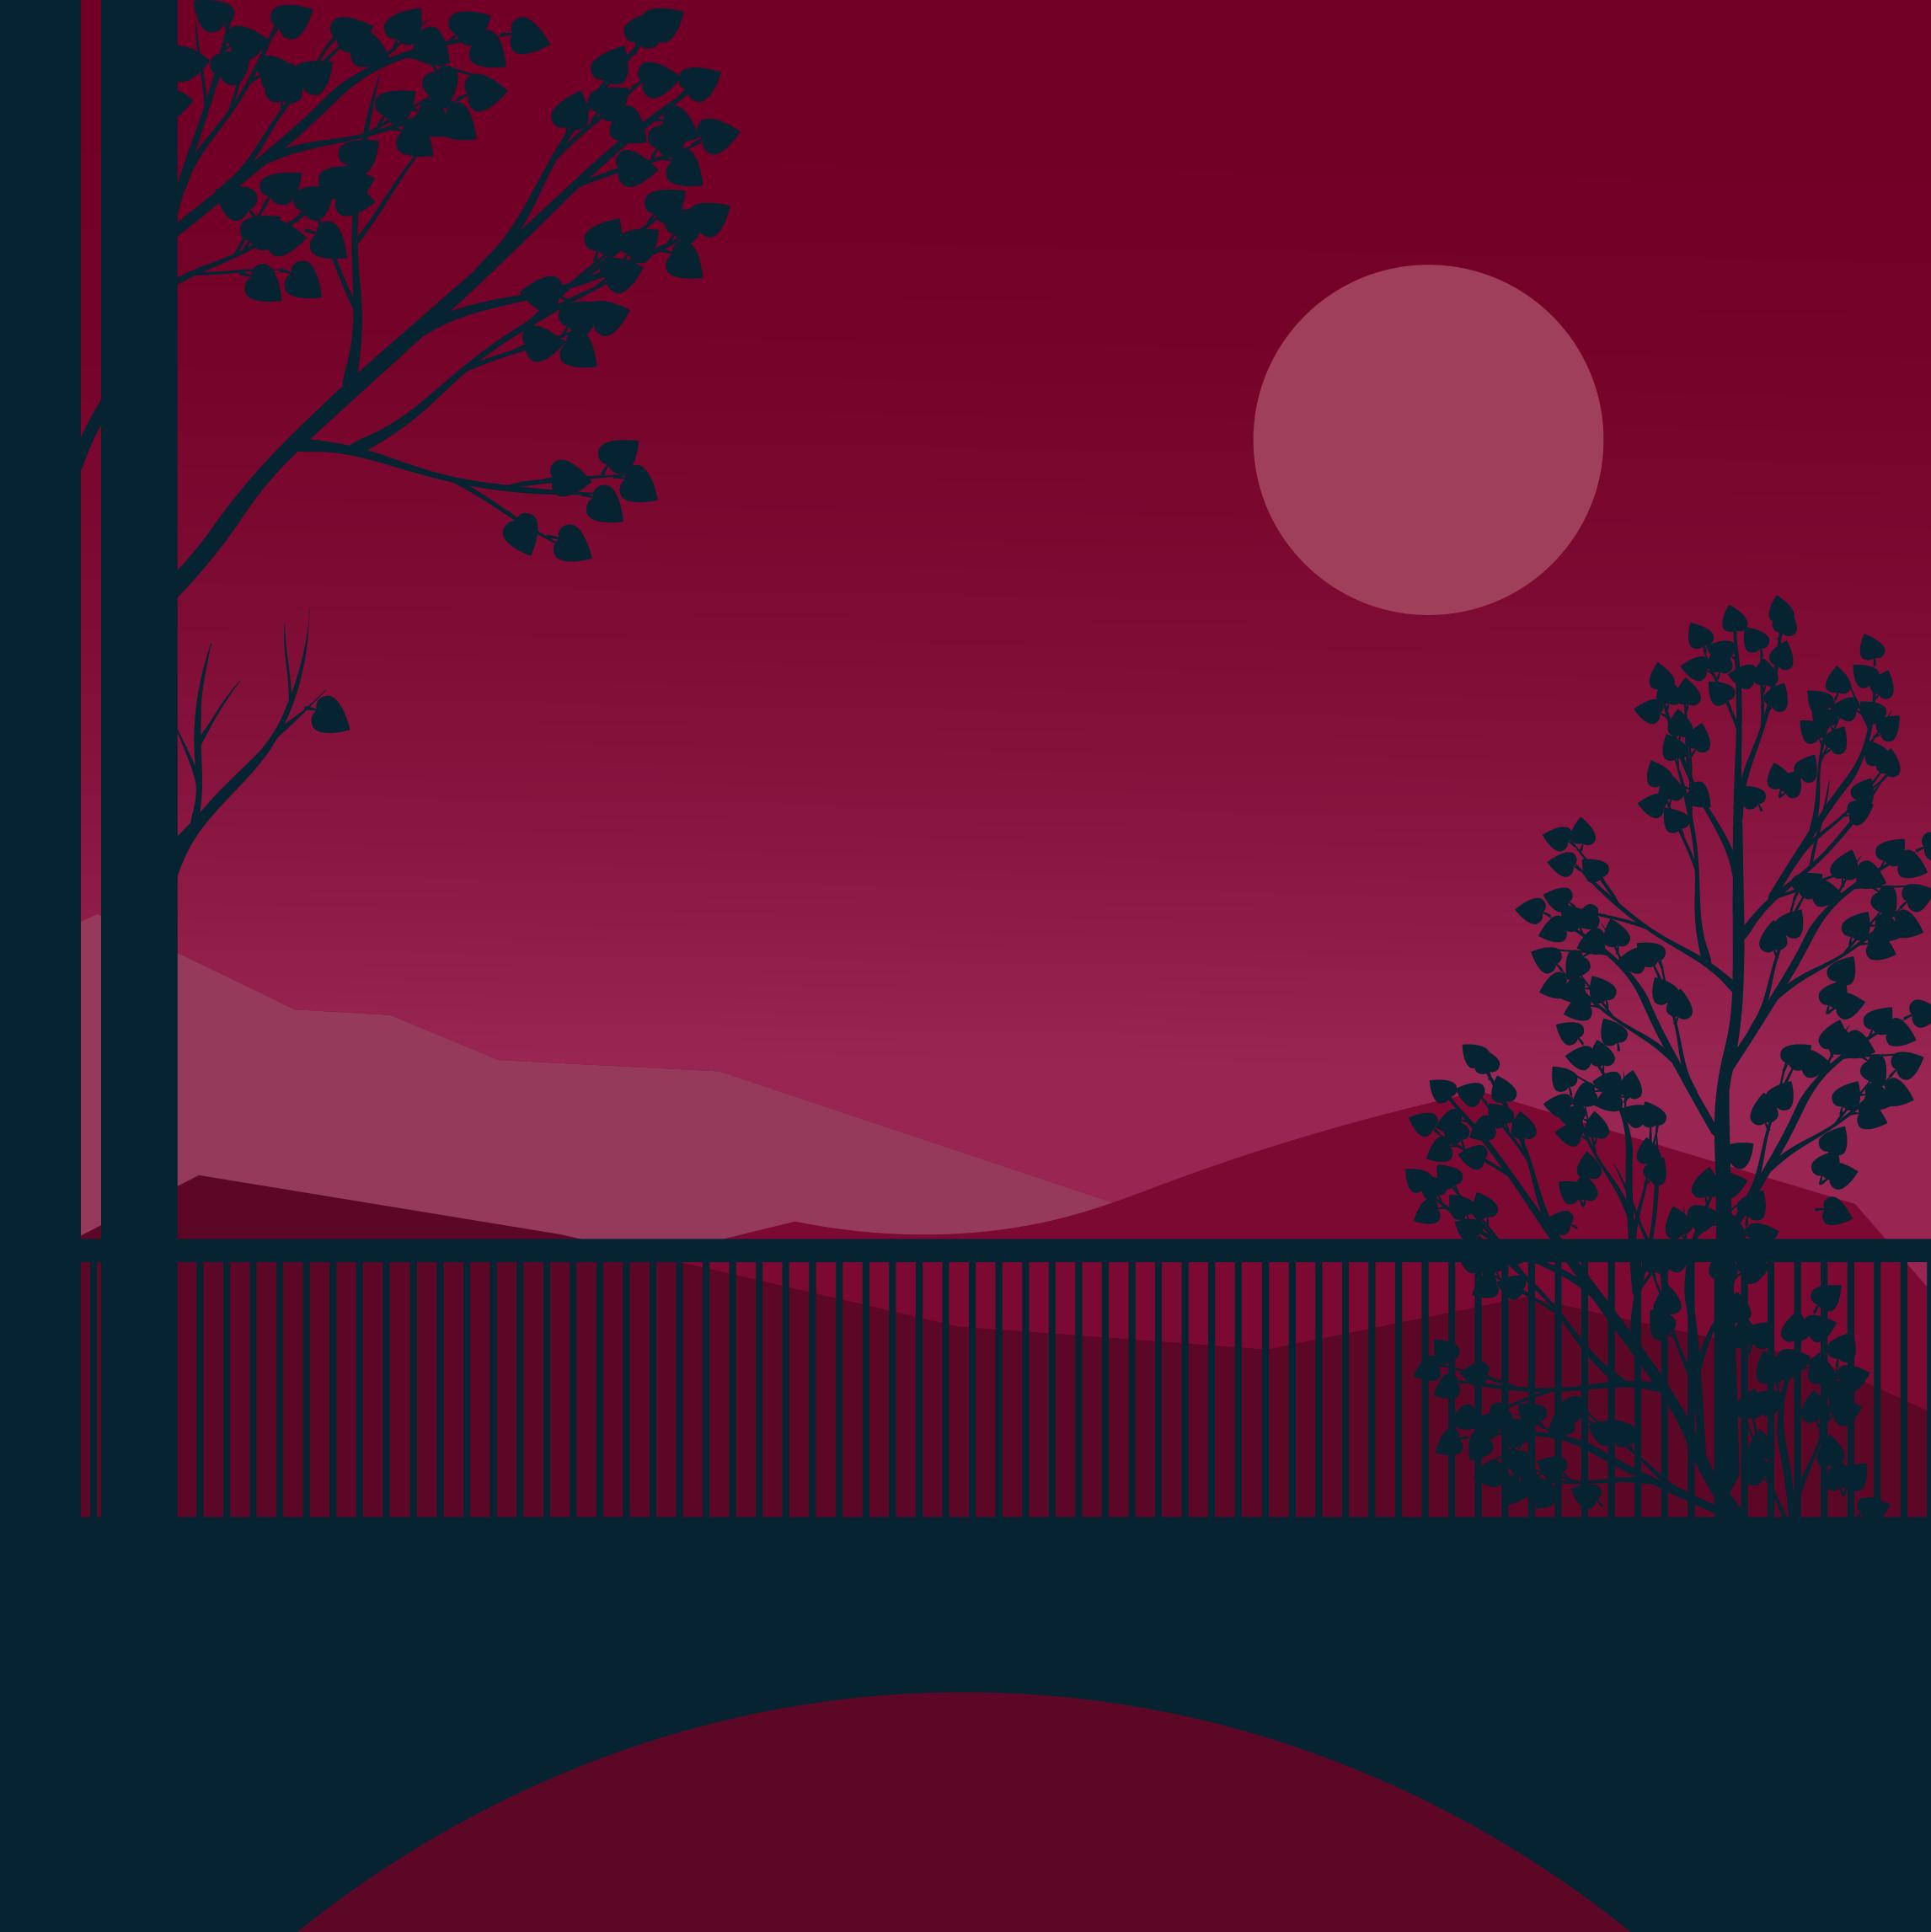 An illustration of a mountainous landscape